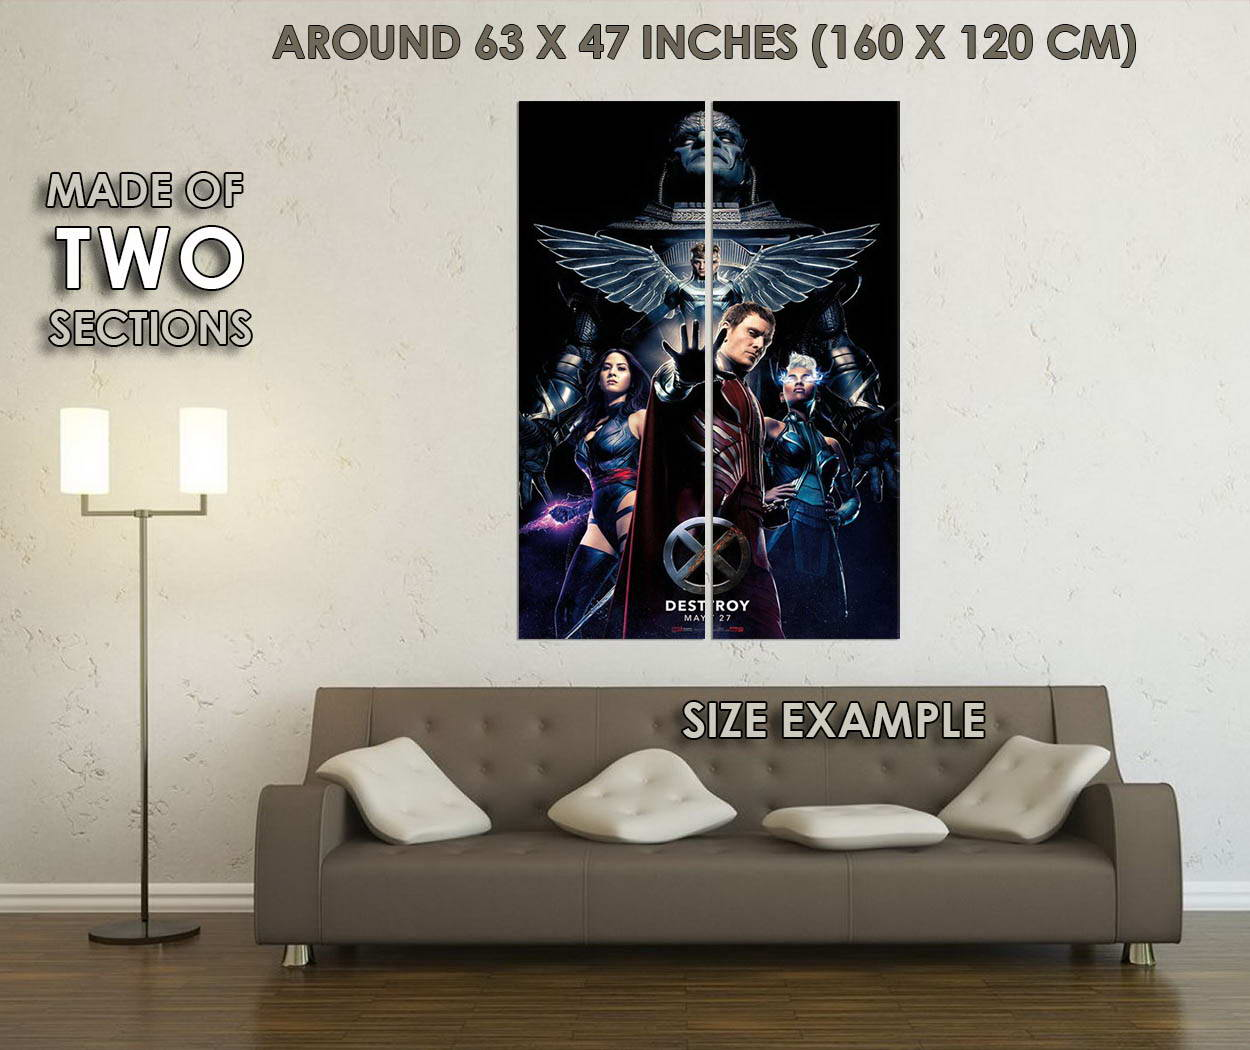 10475-X-Men-Apocalypse-Movie-LAMINATED-POSTER-CA thumbnail 6